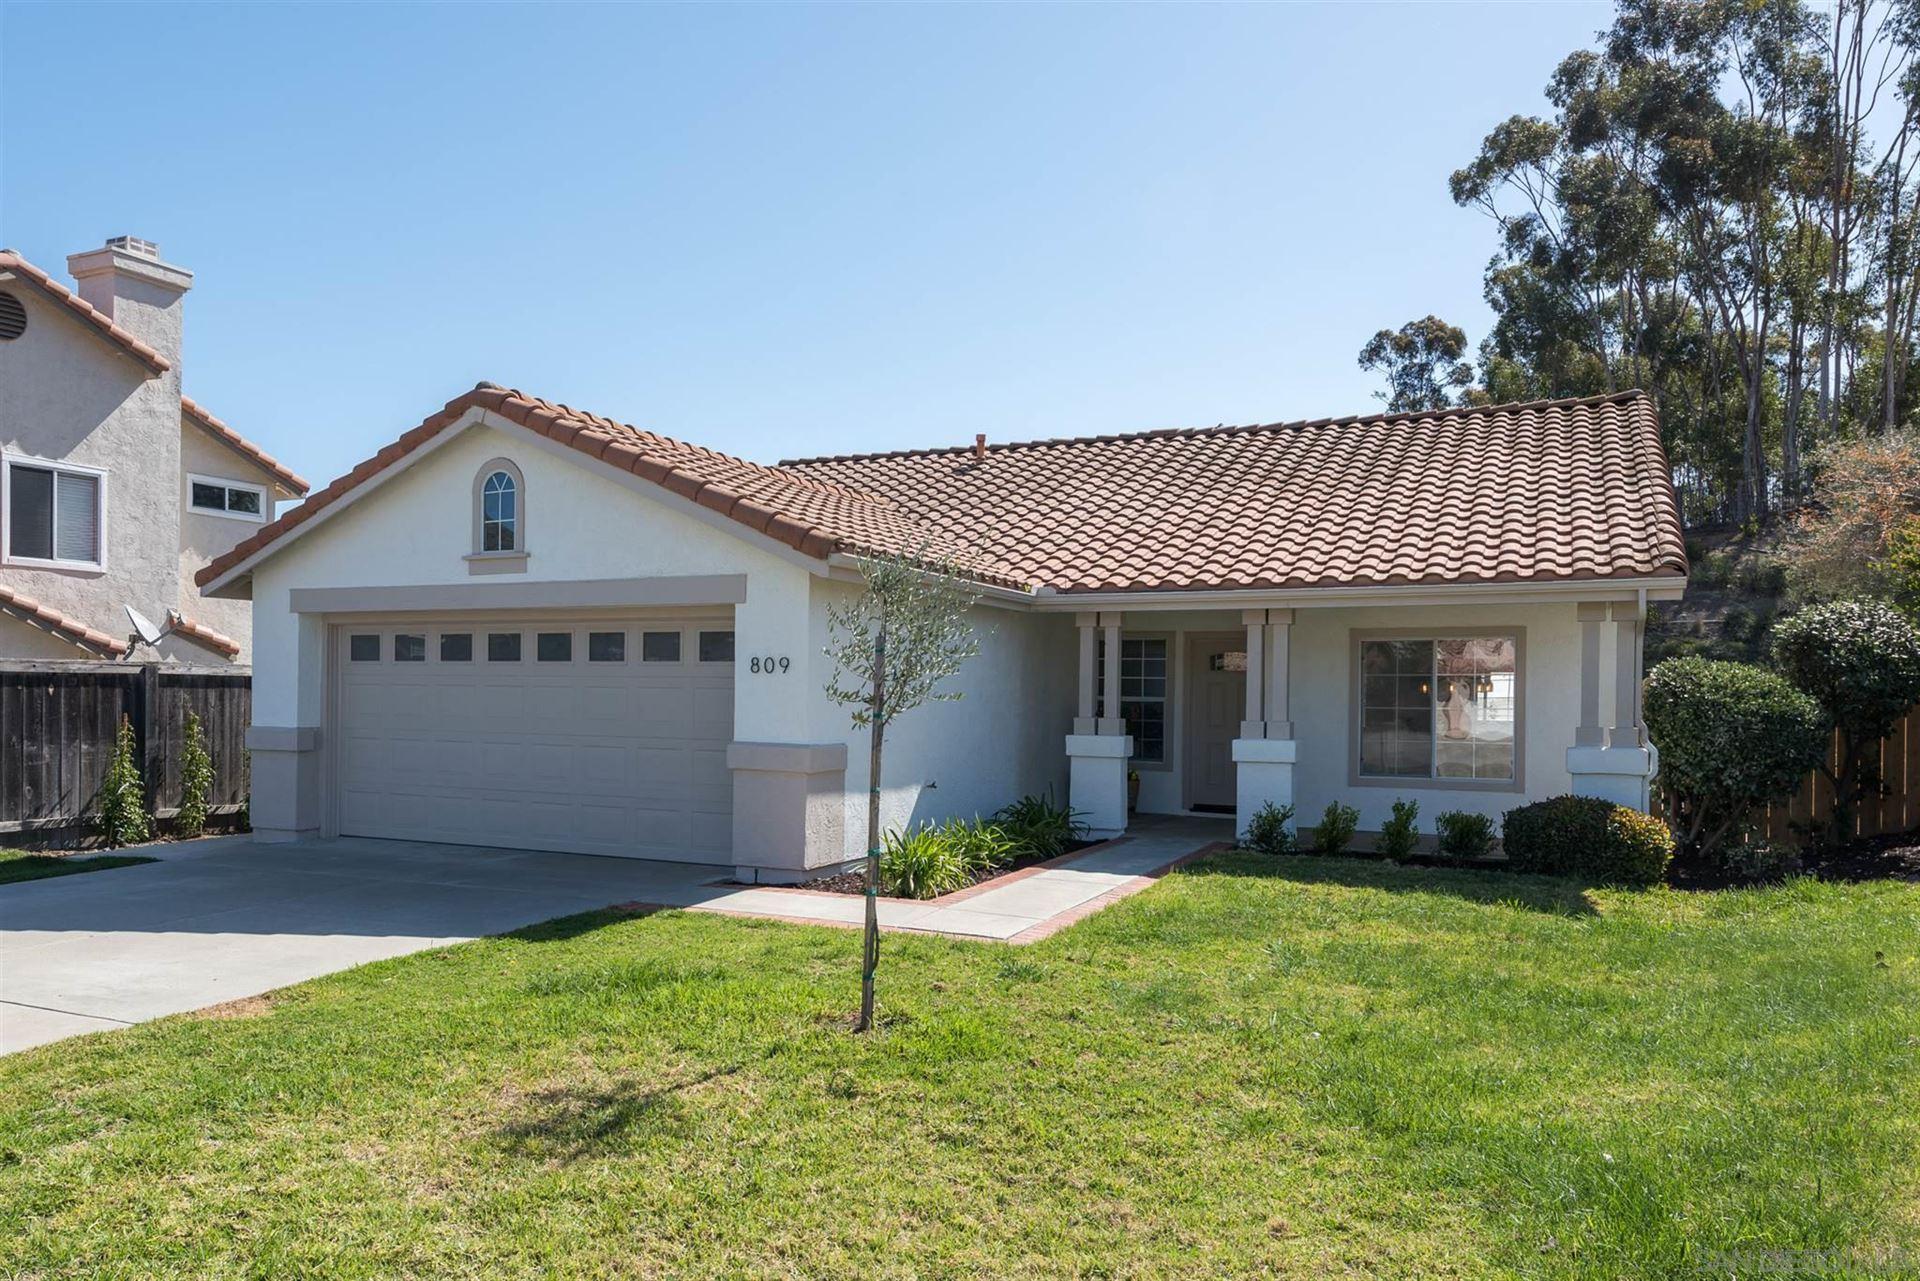 Photo of 809 Palo Alto Court, San Marcos, CA 92069 (MLS # 210008832)